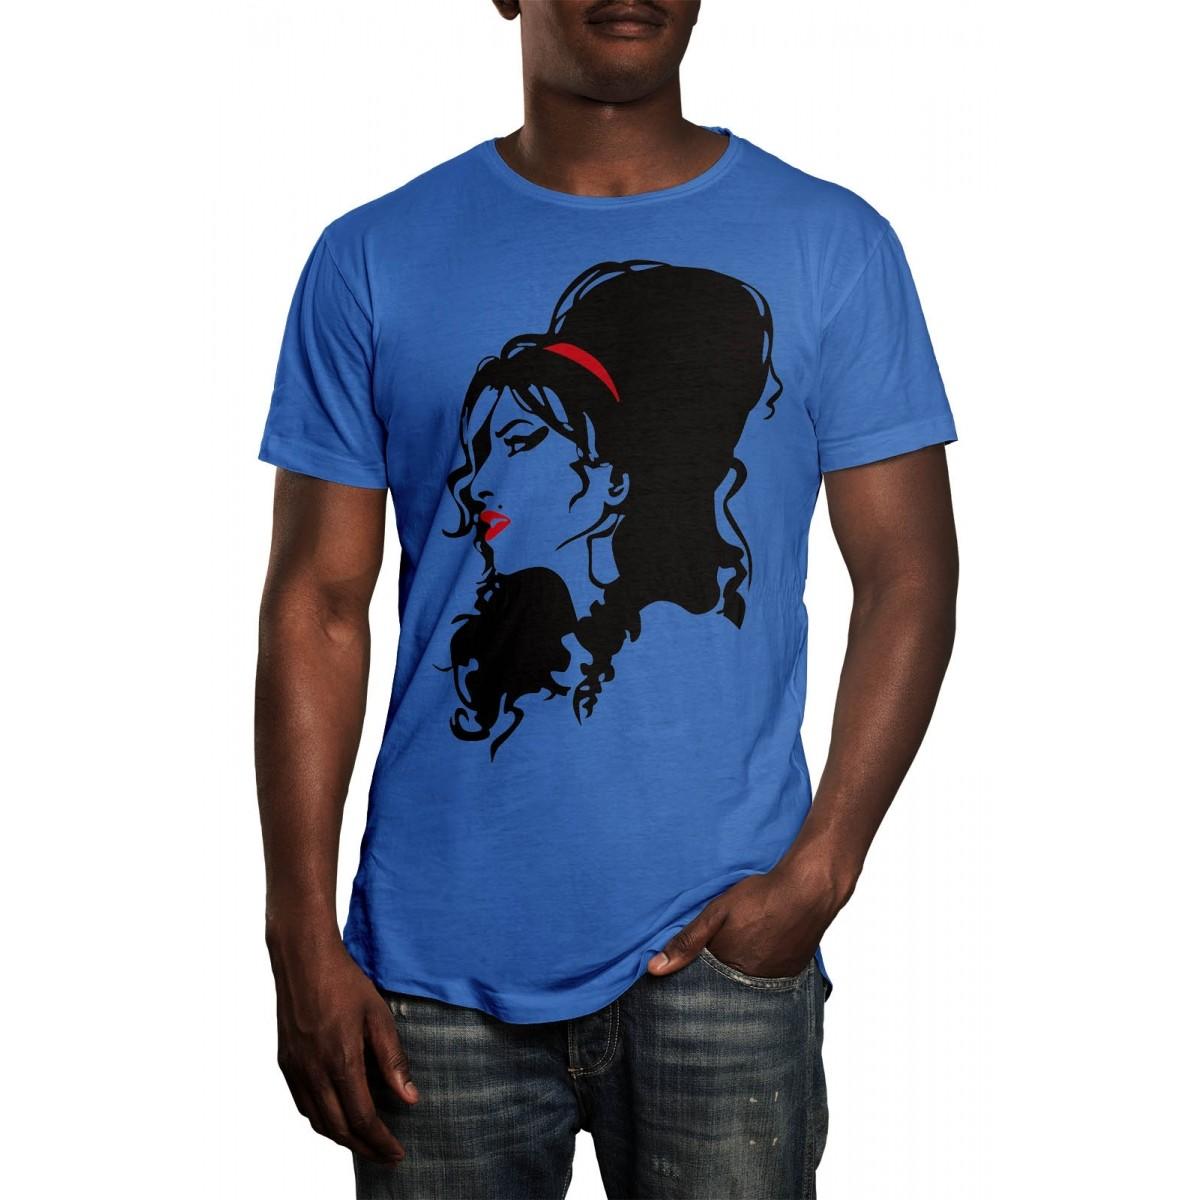 Camiseta HShop Amy Azul - 571  - HShop